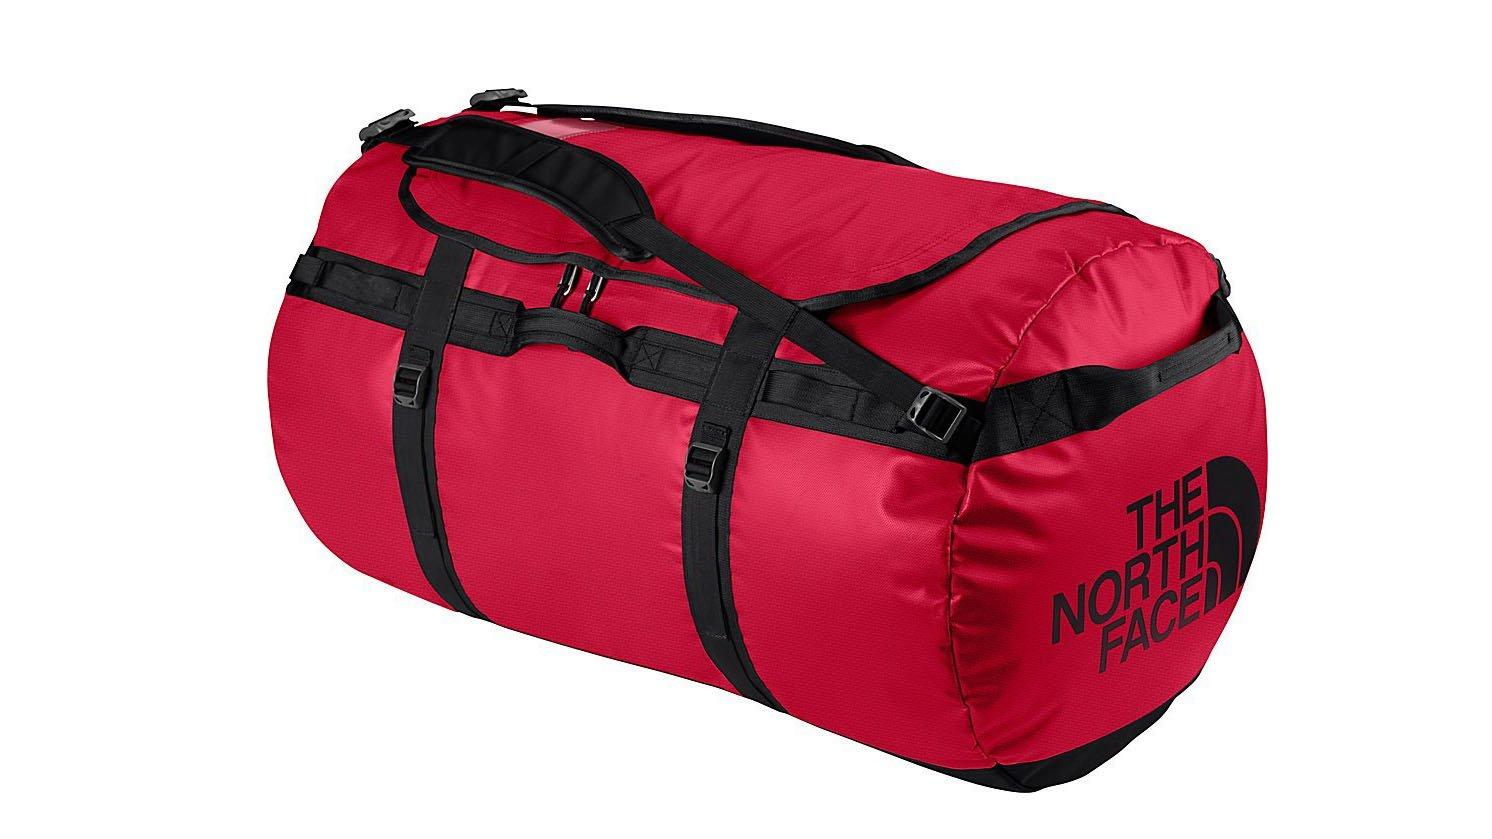 Best Waterproof Duffel Bag Uk- Fenix Toulouse Handball 6d0e38c14bc04